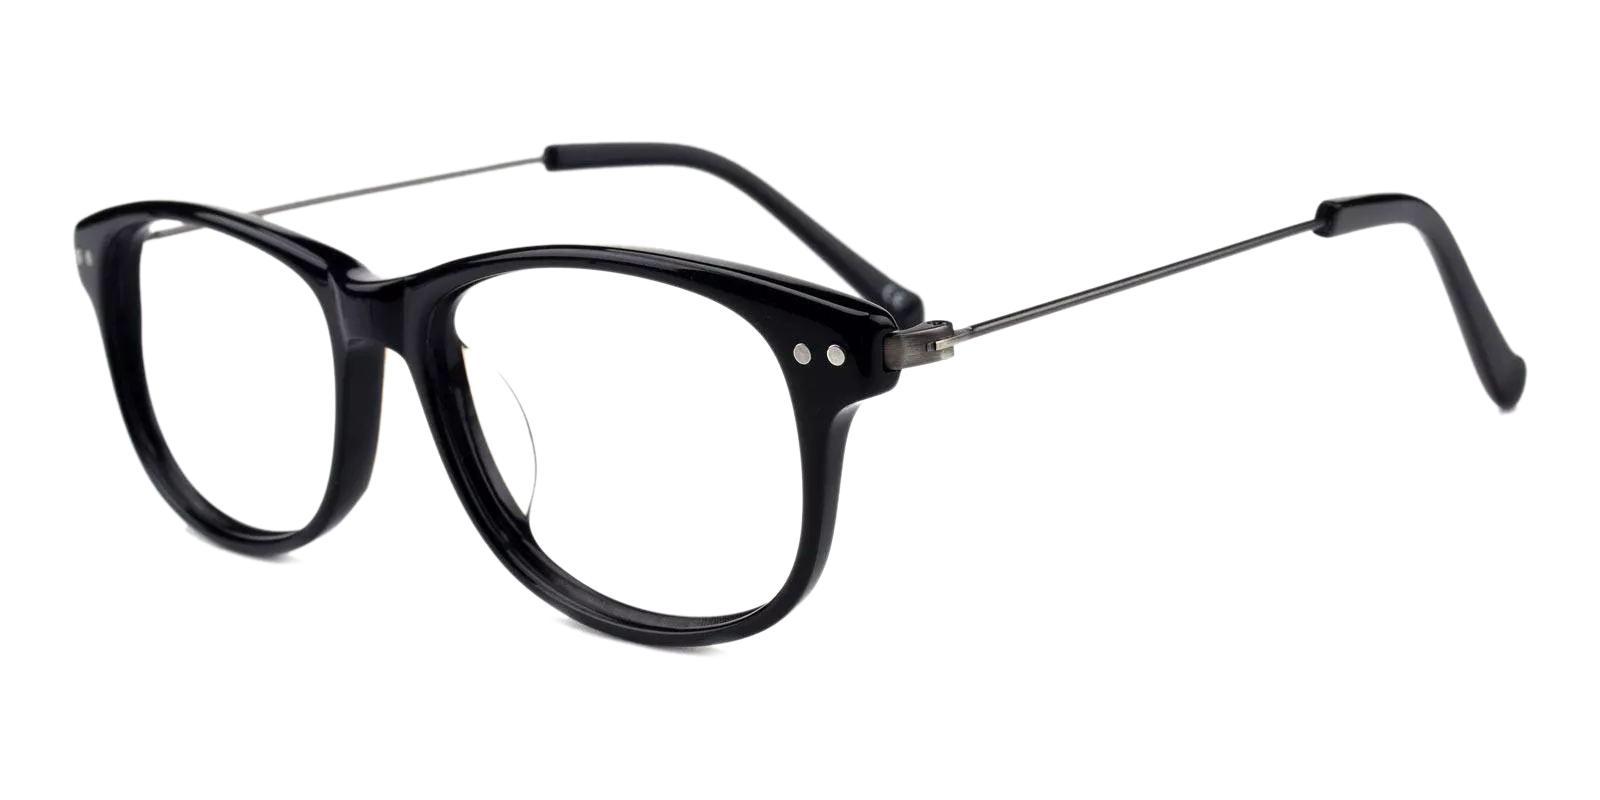 Corey Black Combination Eyeglasses , Fashion , UniversalBridgeFit Frames from ABBE Glasses